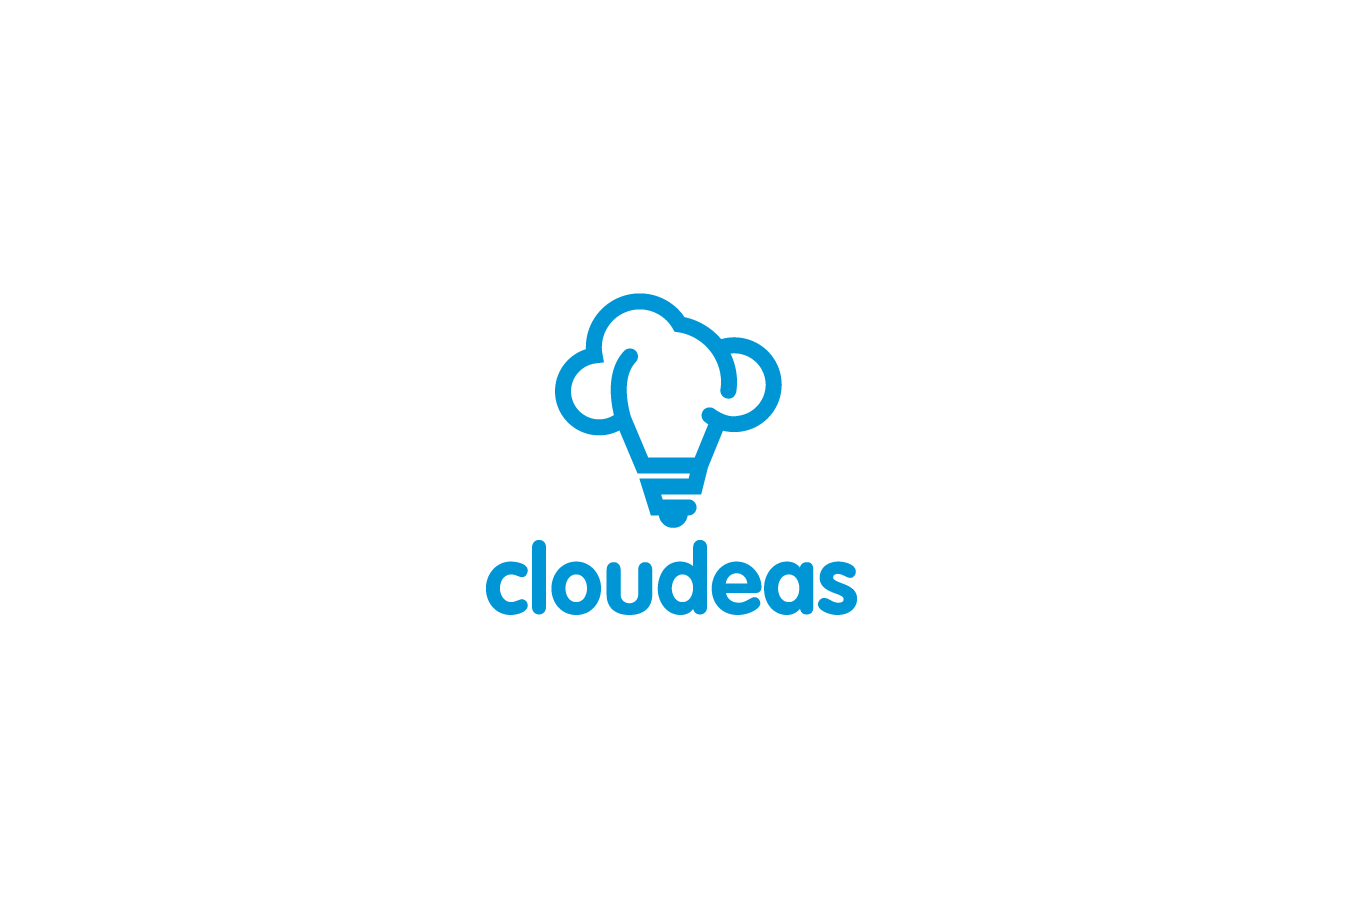 cloudeas lightbulb cloud logo logo cowboy